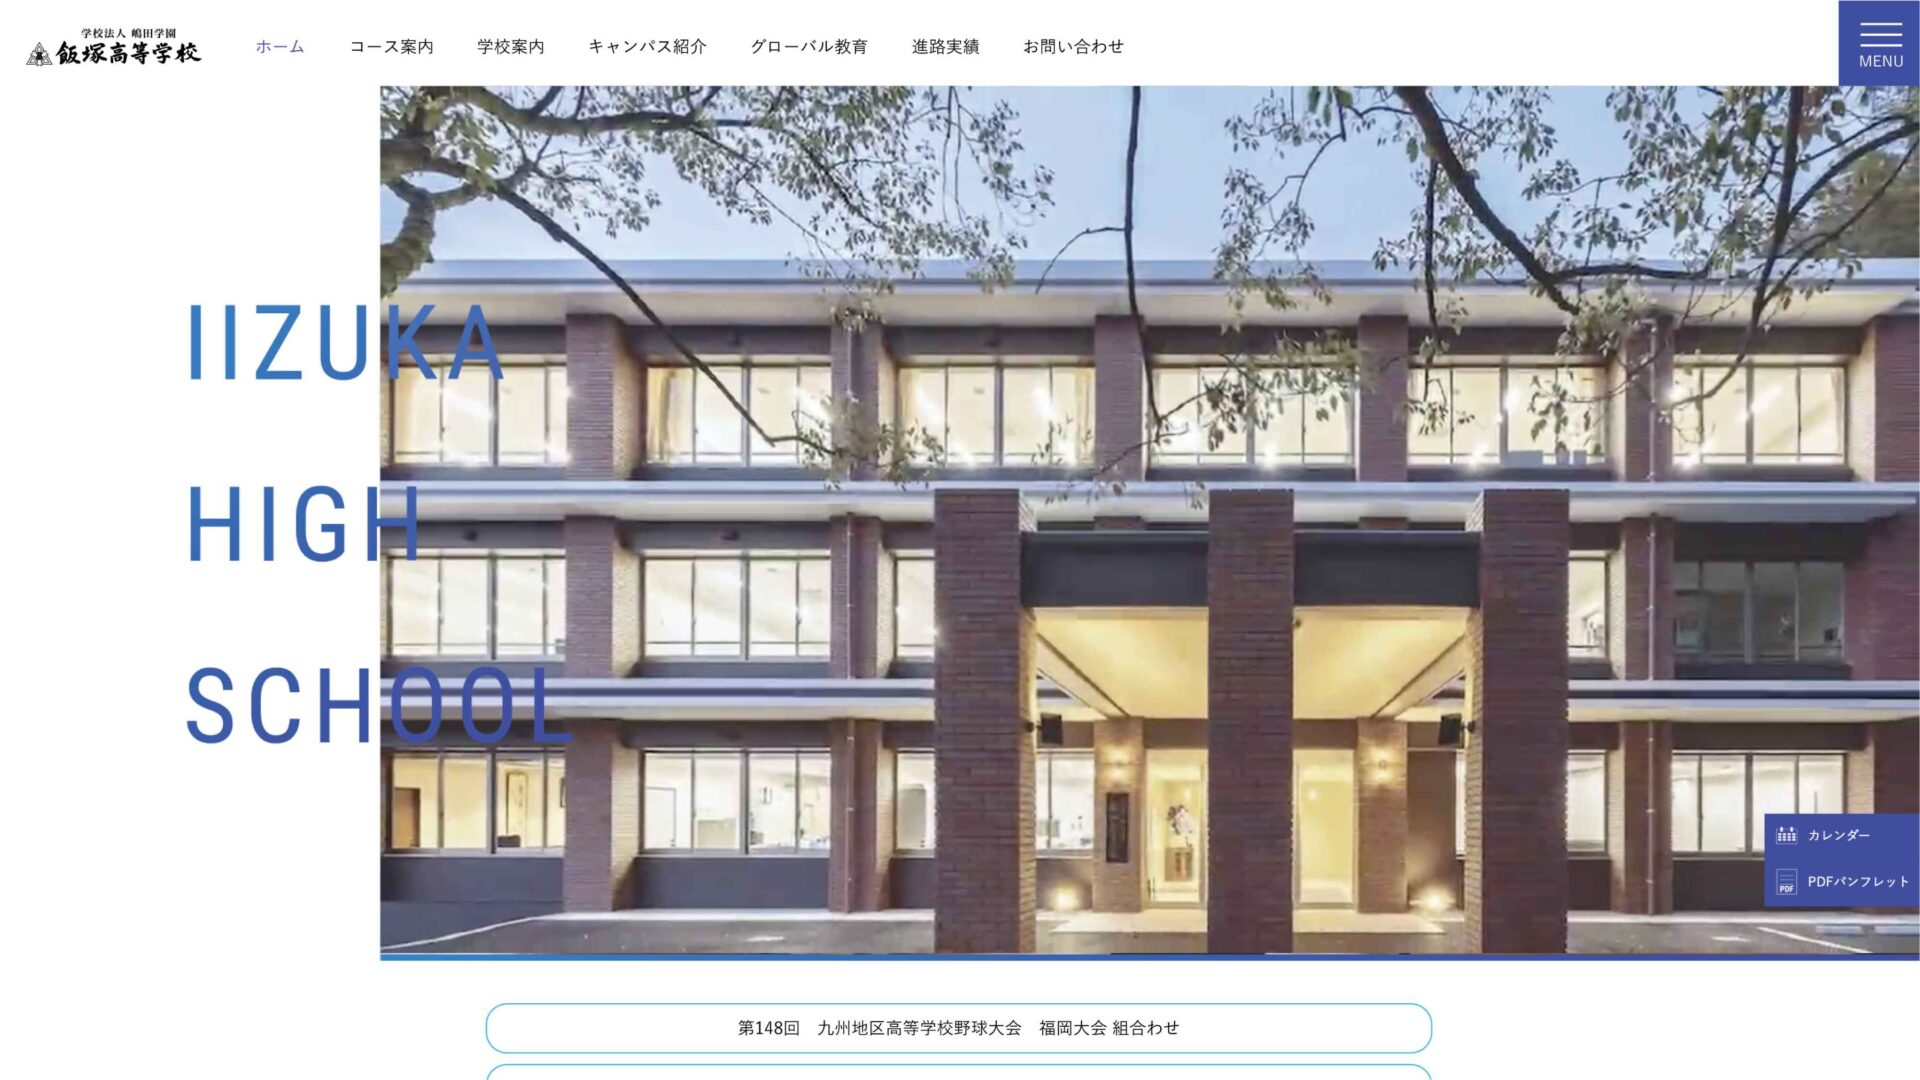 「IIZUKA HIGH SCHOOL」のサムネイル画像